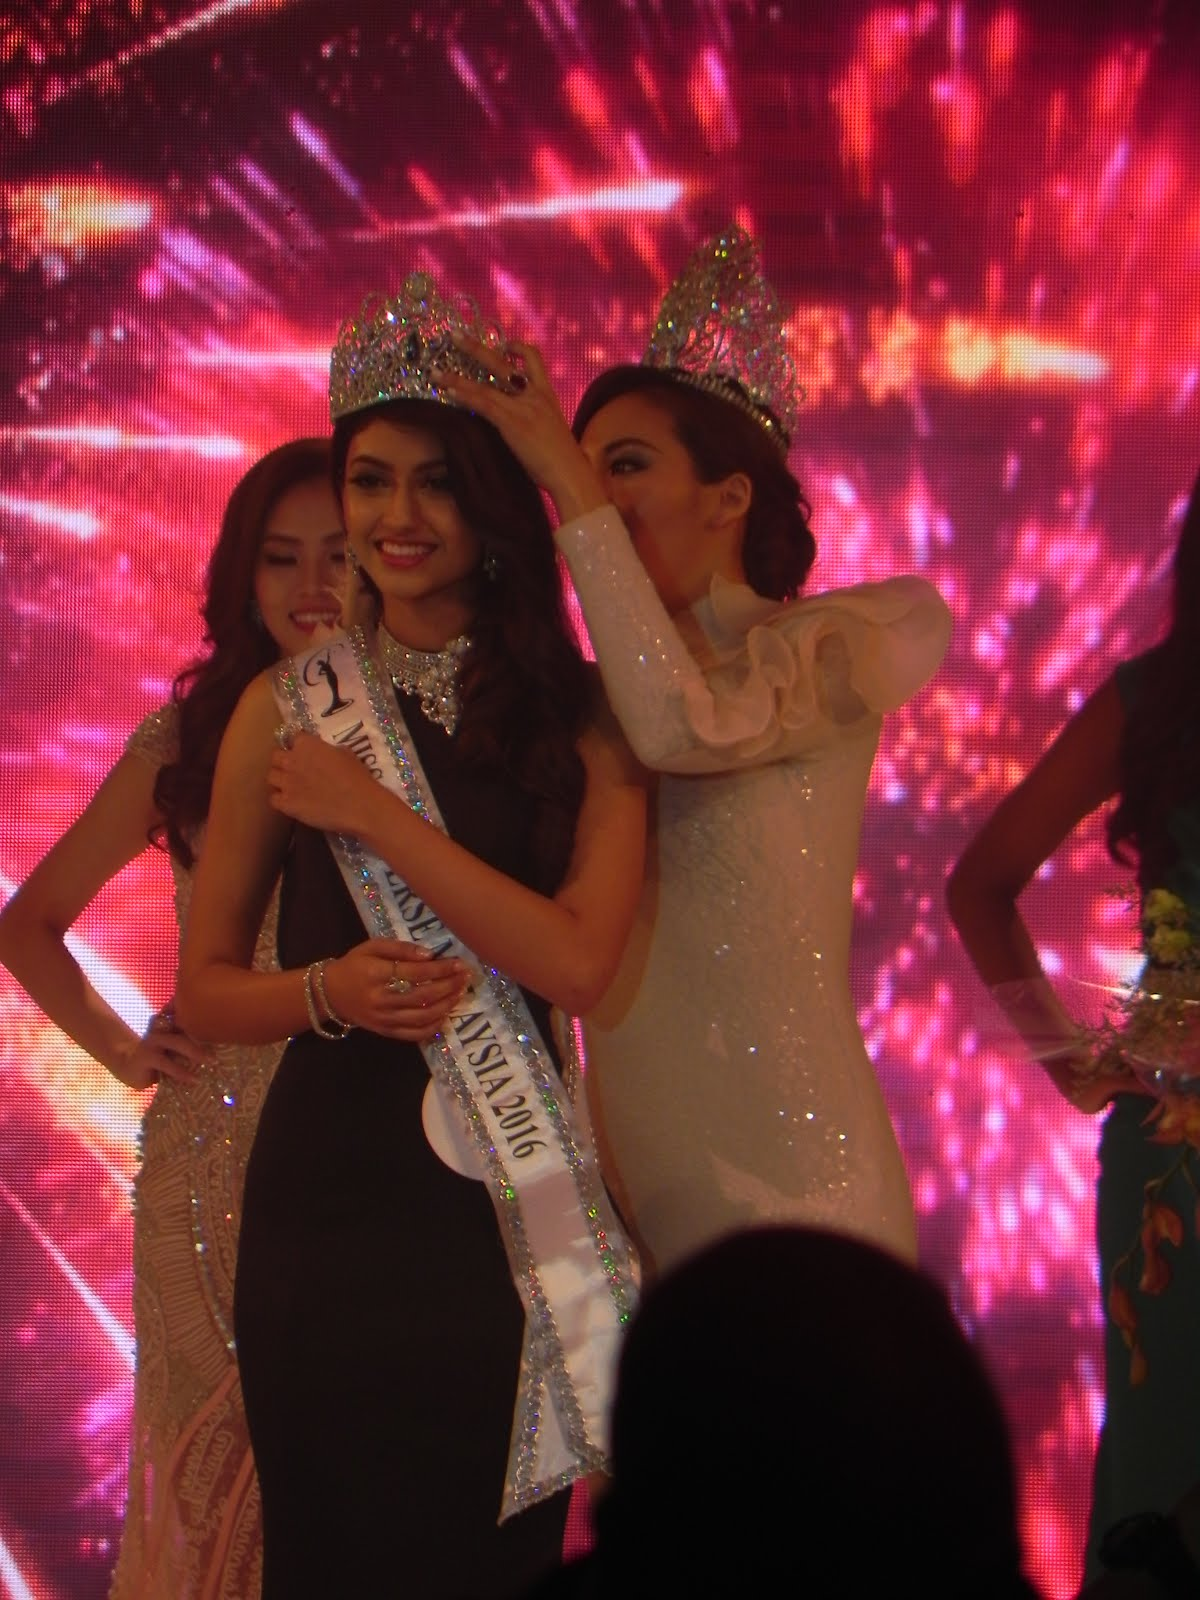 KIRAN JASSAL. THE MISS UNIVERSE MALAYSIA 2016 WINNER.